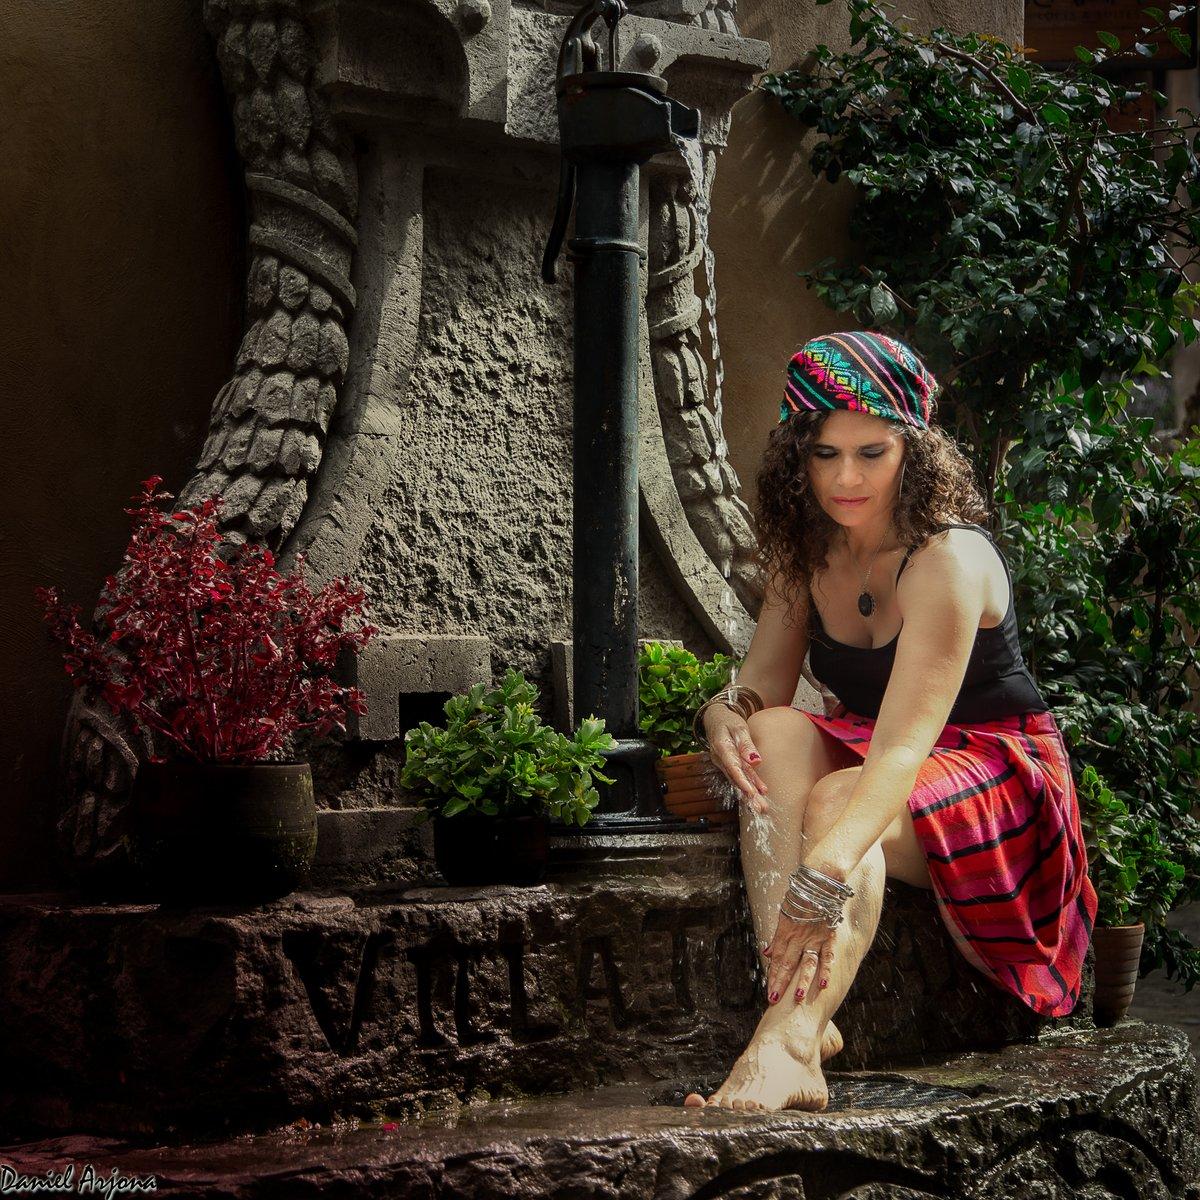 Photo by: Daniel Arjona Instagram: darjonac  #model #fashion #photography #love #style #instagood #photooftheday #beauty #like #instagram #beautiful #follow #photo #art #picoftheday #cute #myself #photoshoot #girl #smile #portrait #happy #photographer #modeling #selfie #nature